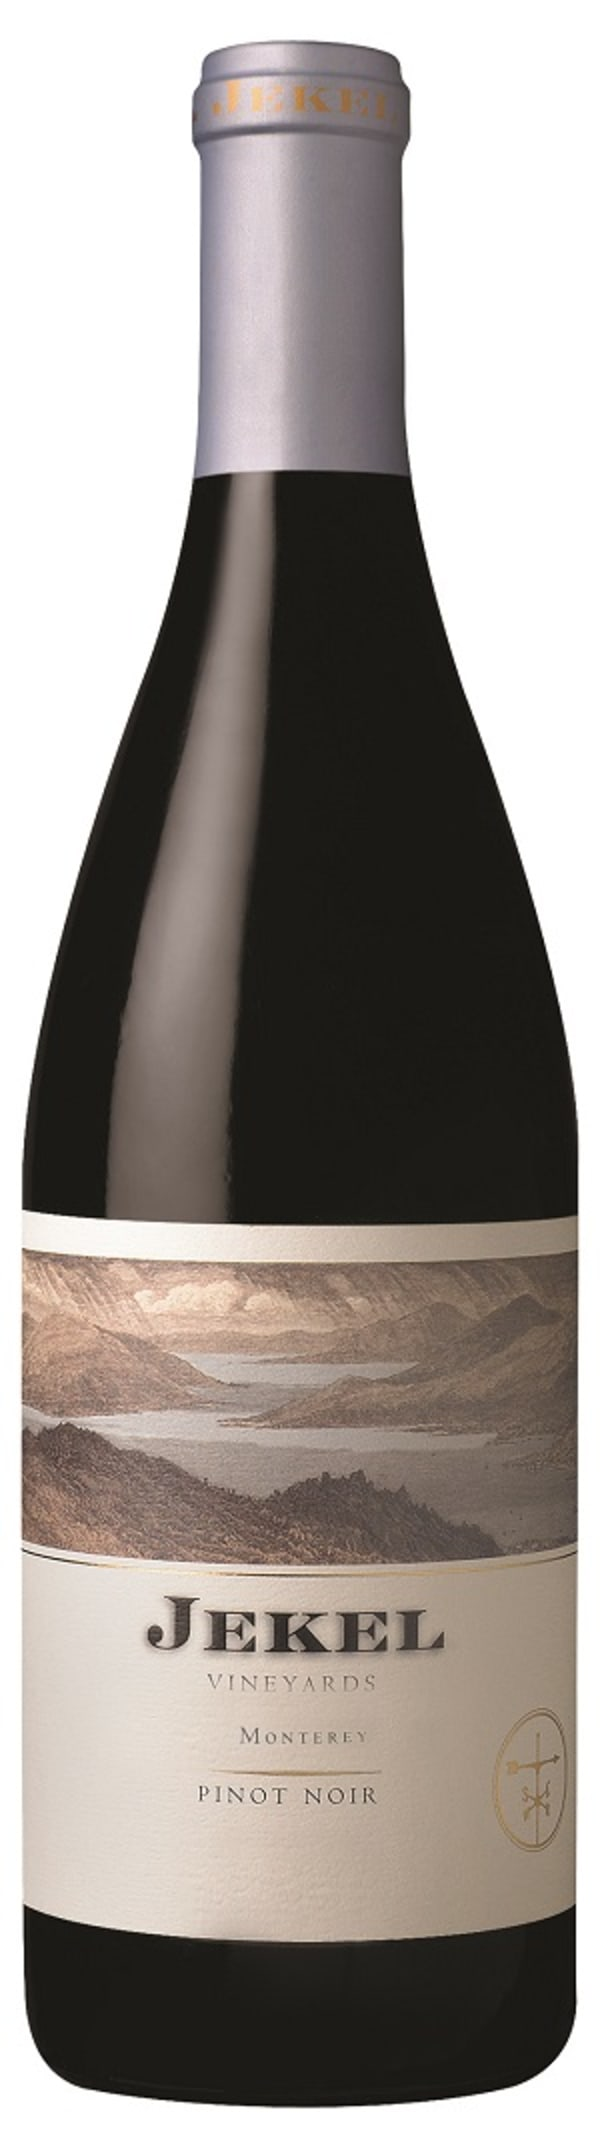 Jekel Pinot Noir 2014